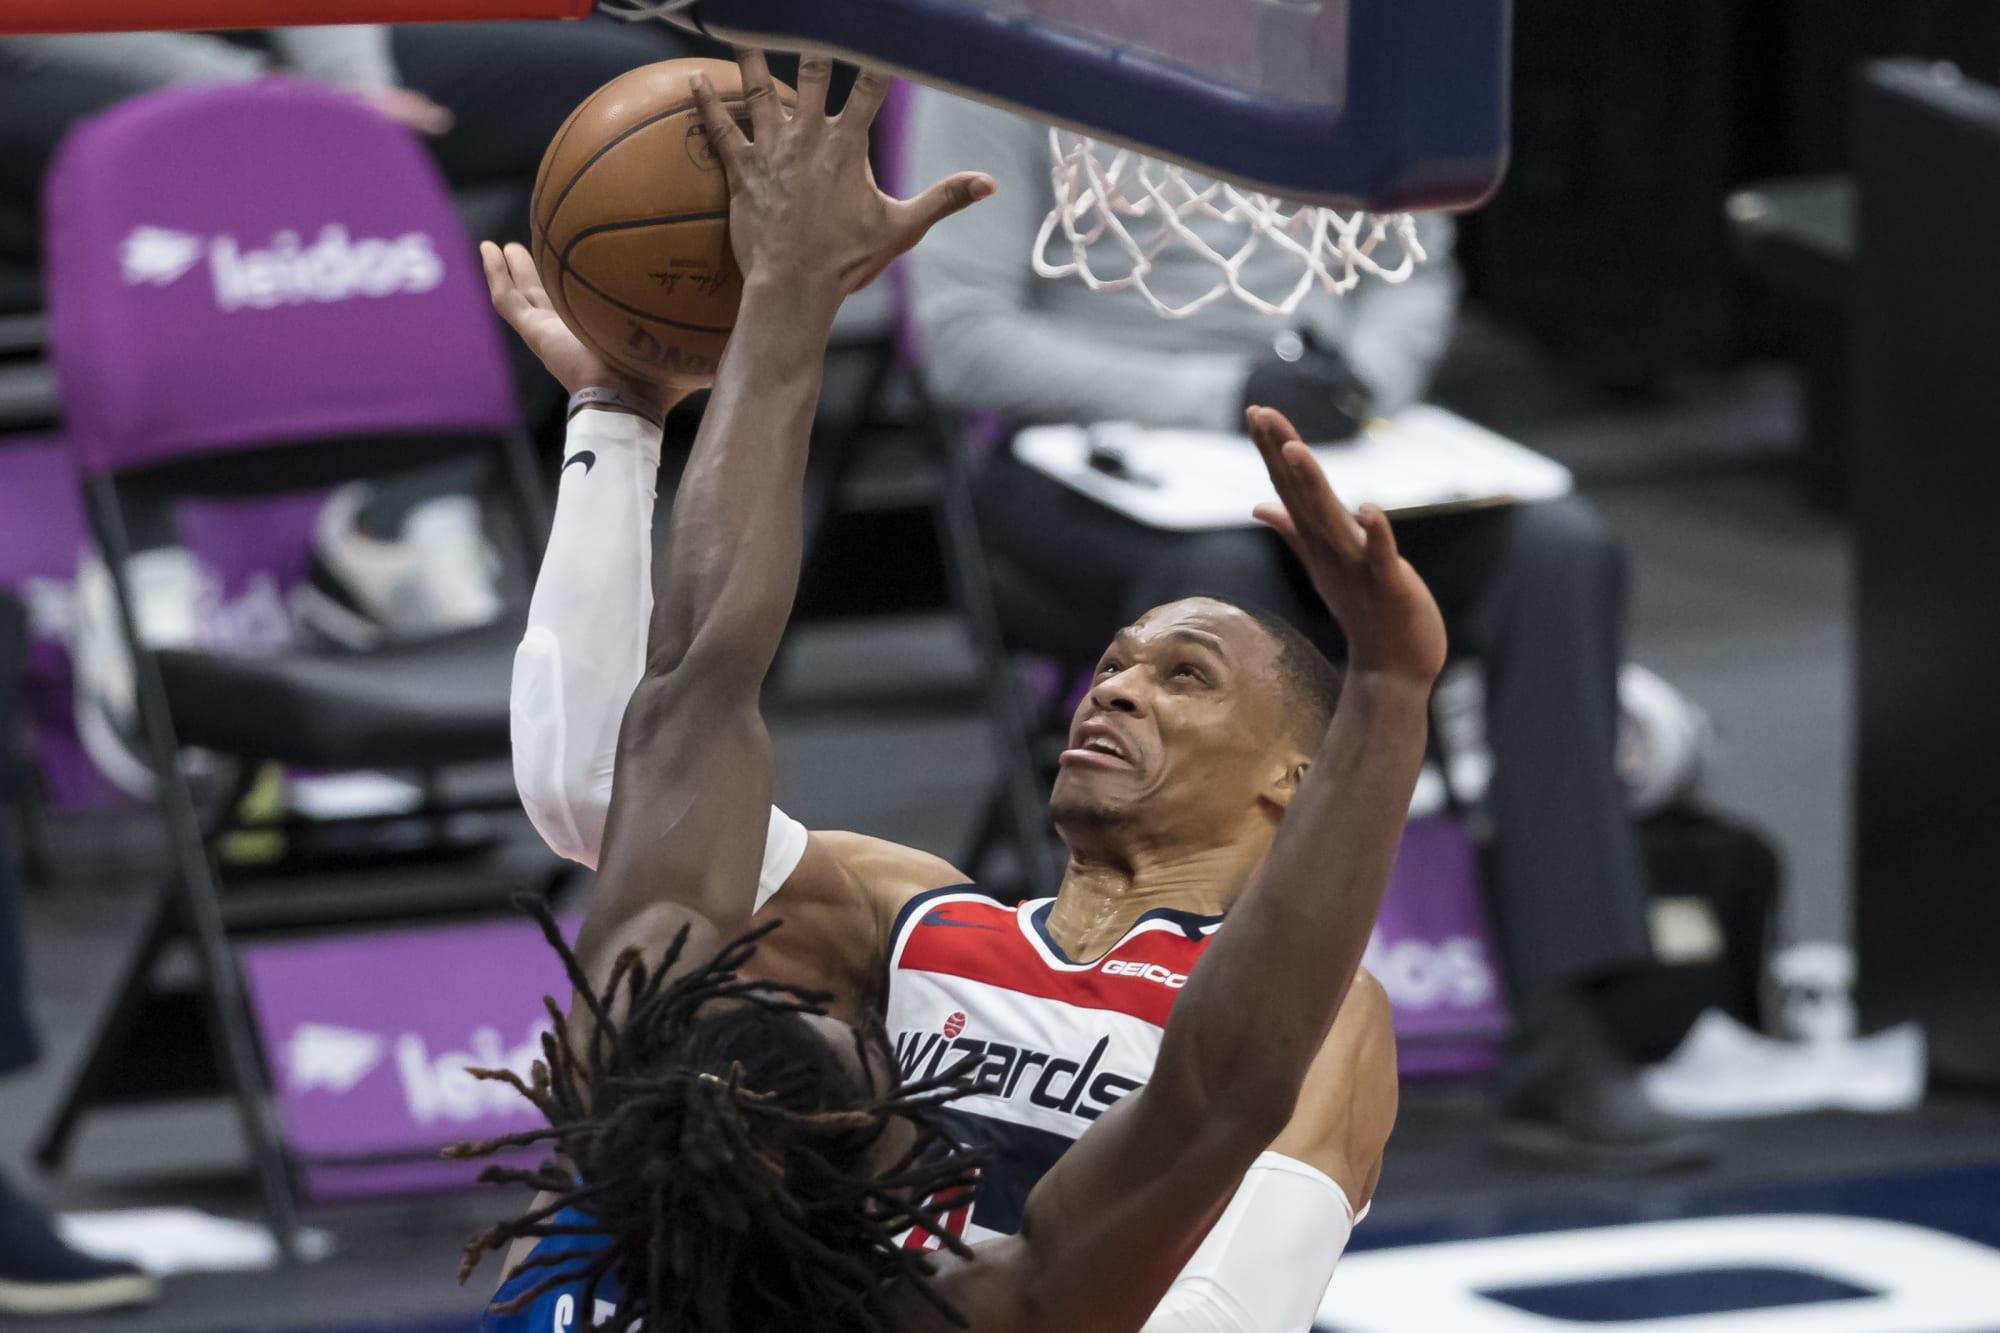 Detroit Pistons: Isaiah Stewart is already a top shot blocker